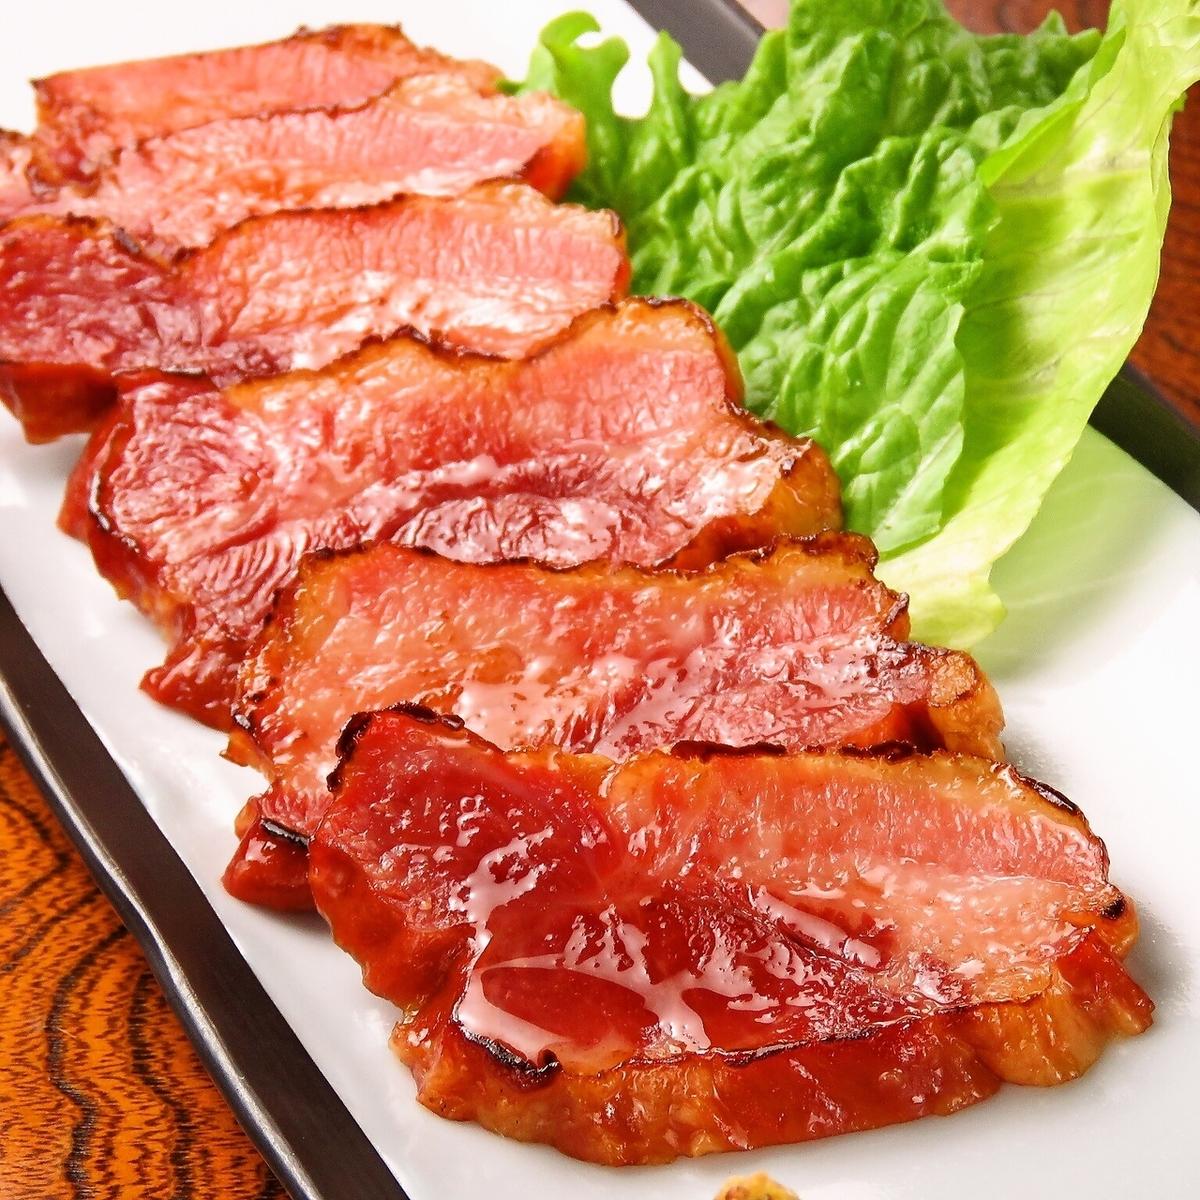 Okinawan pig bacon